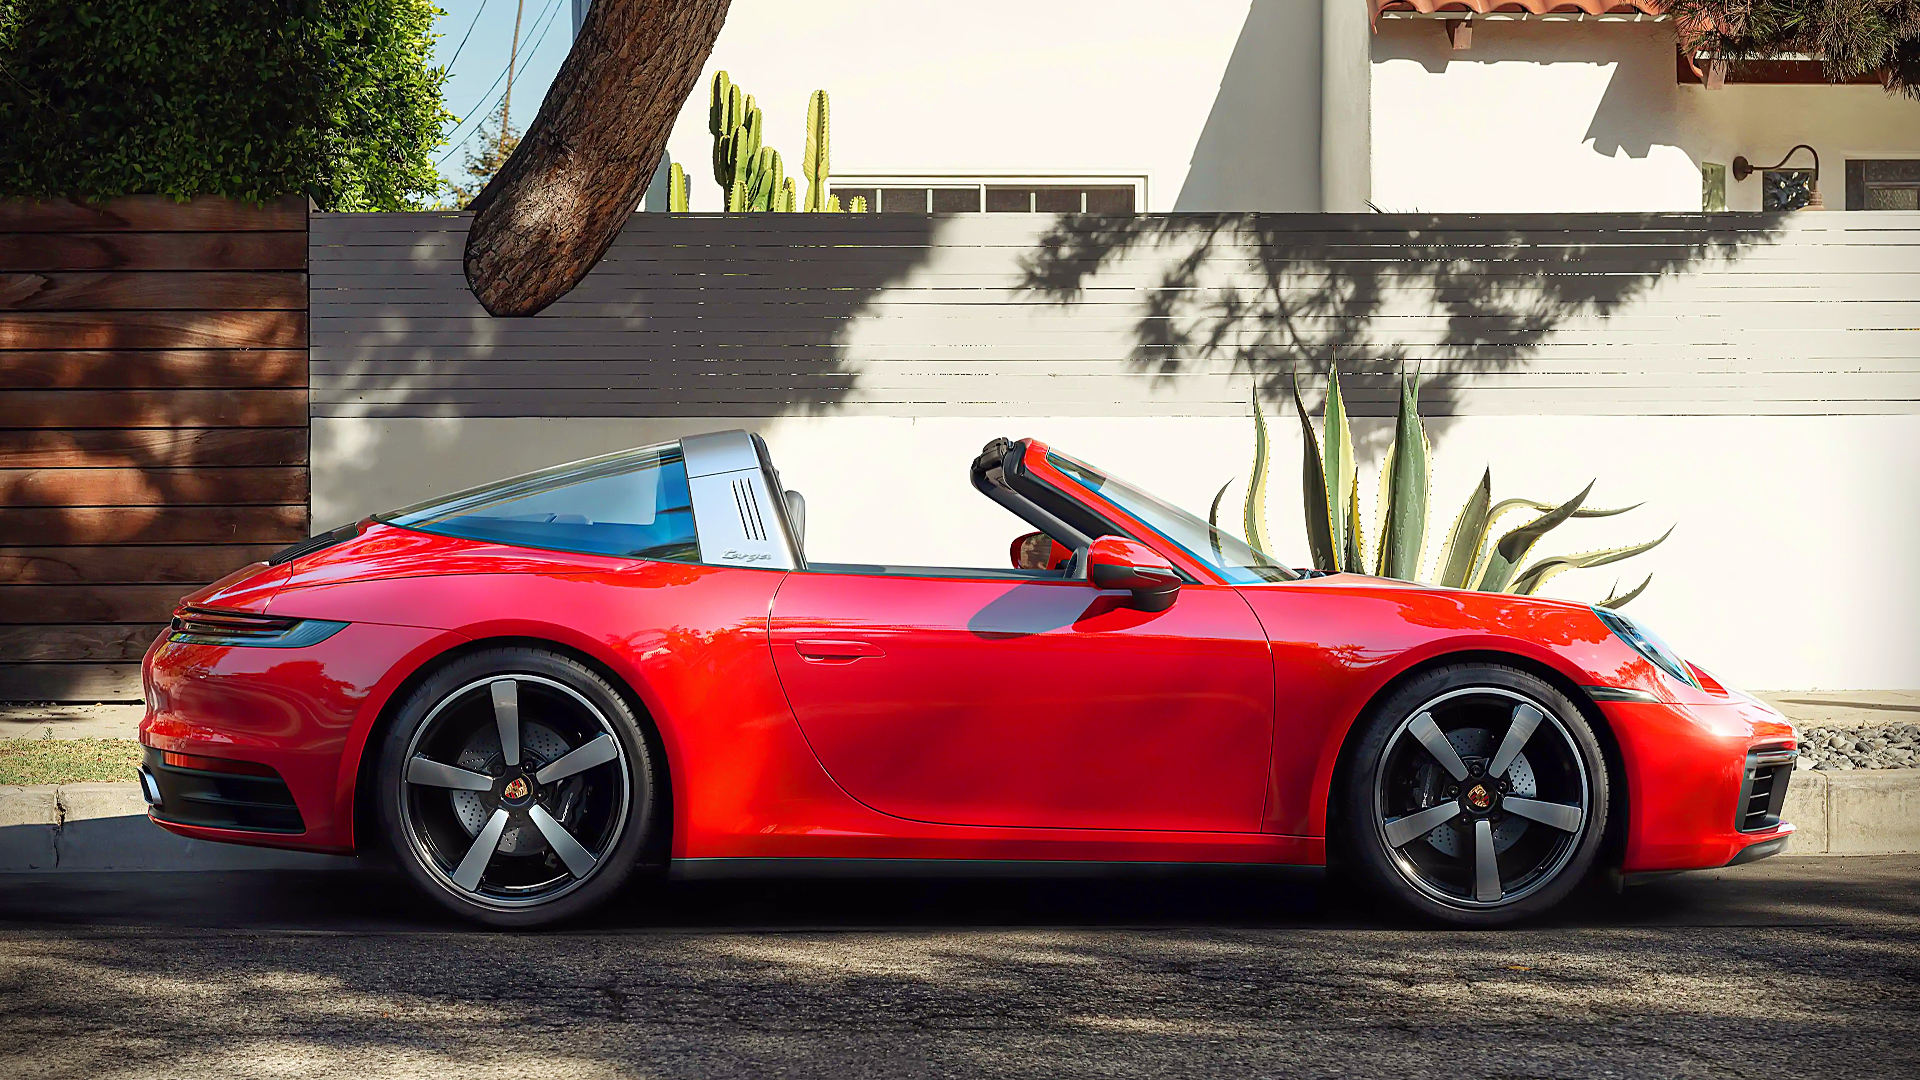 2021 Porsche 911 Targa 4 Red Images Wallpaper